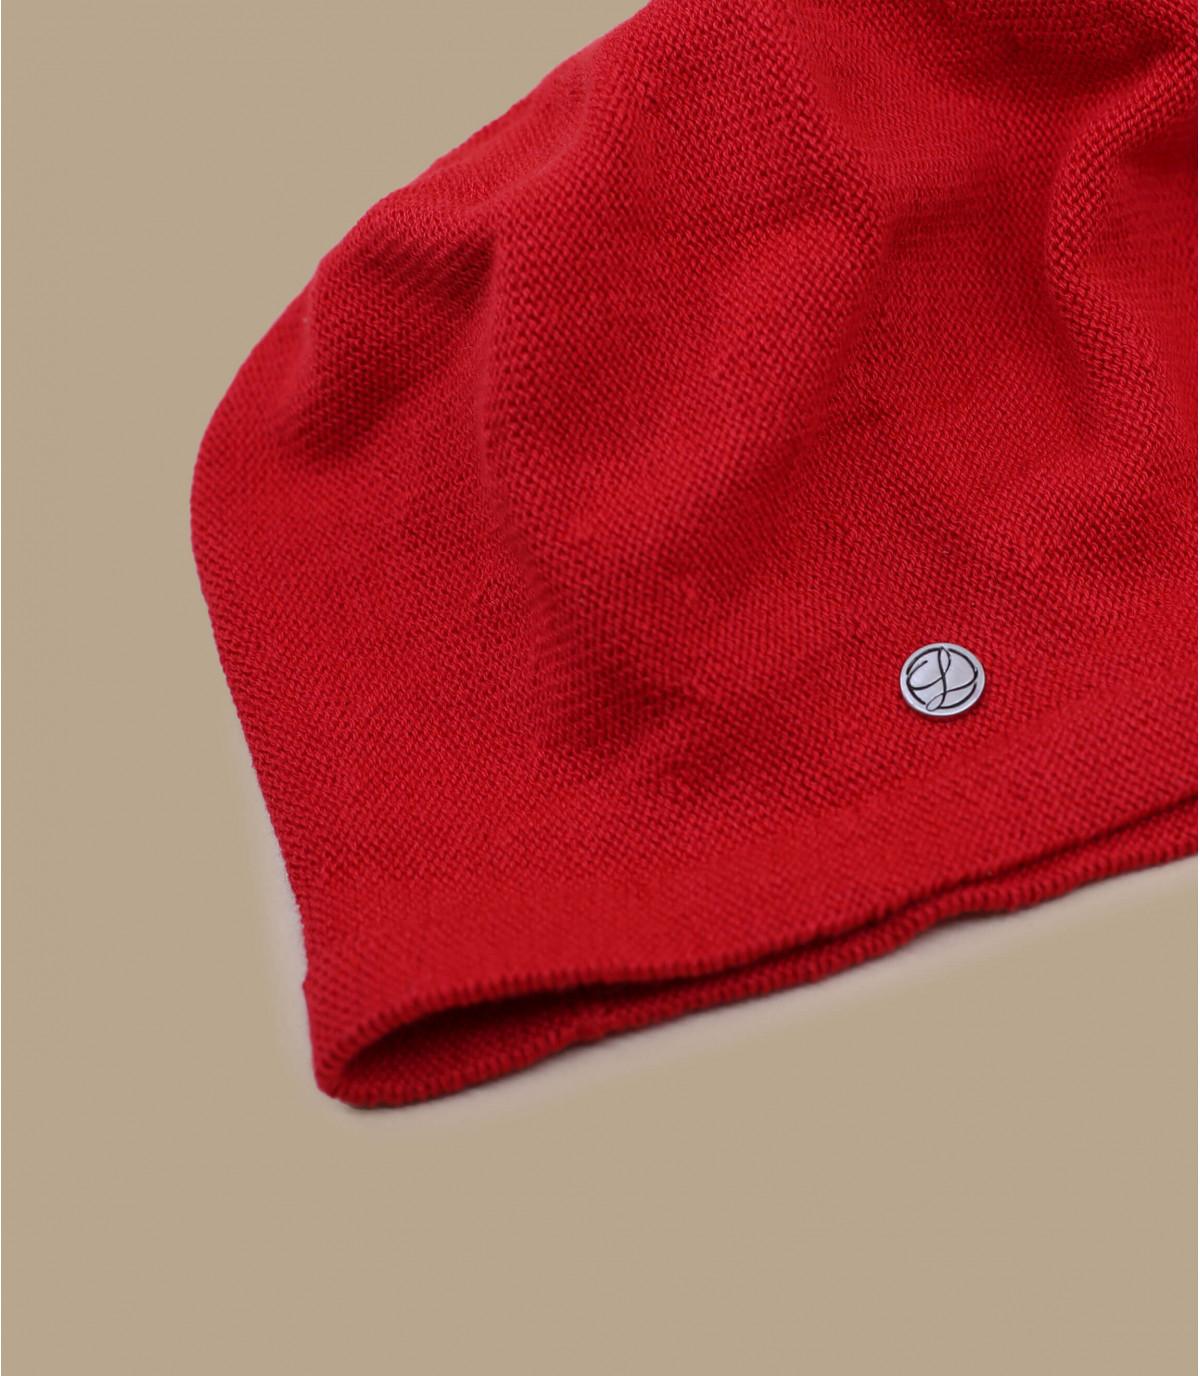 Dettagli Belza red - image 3